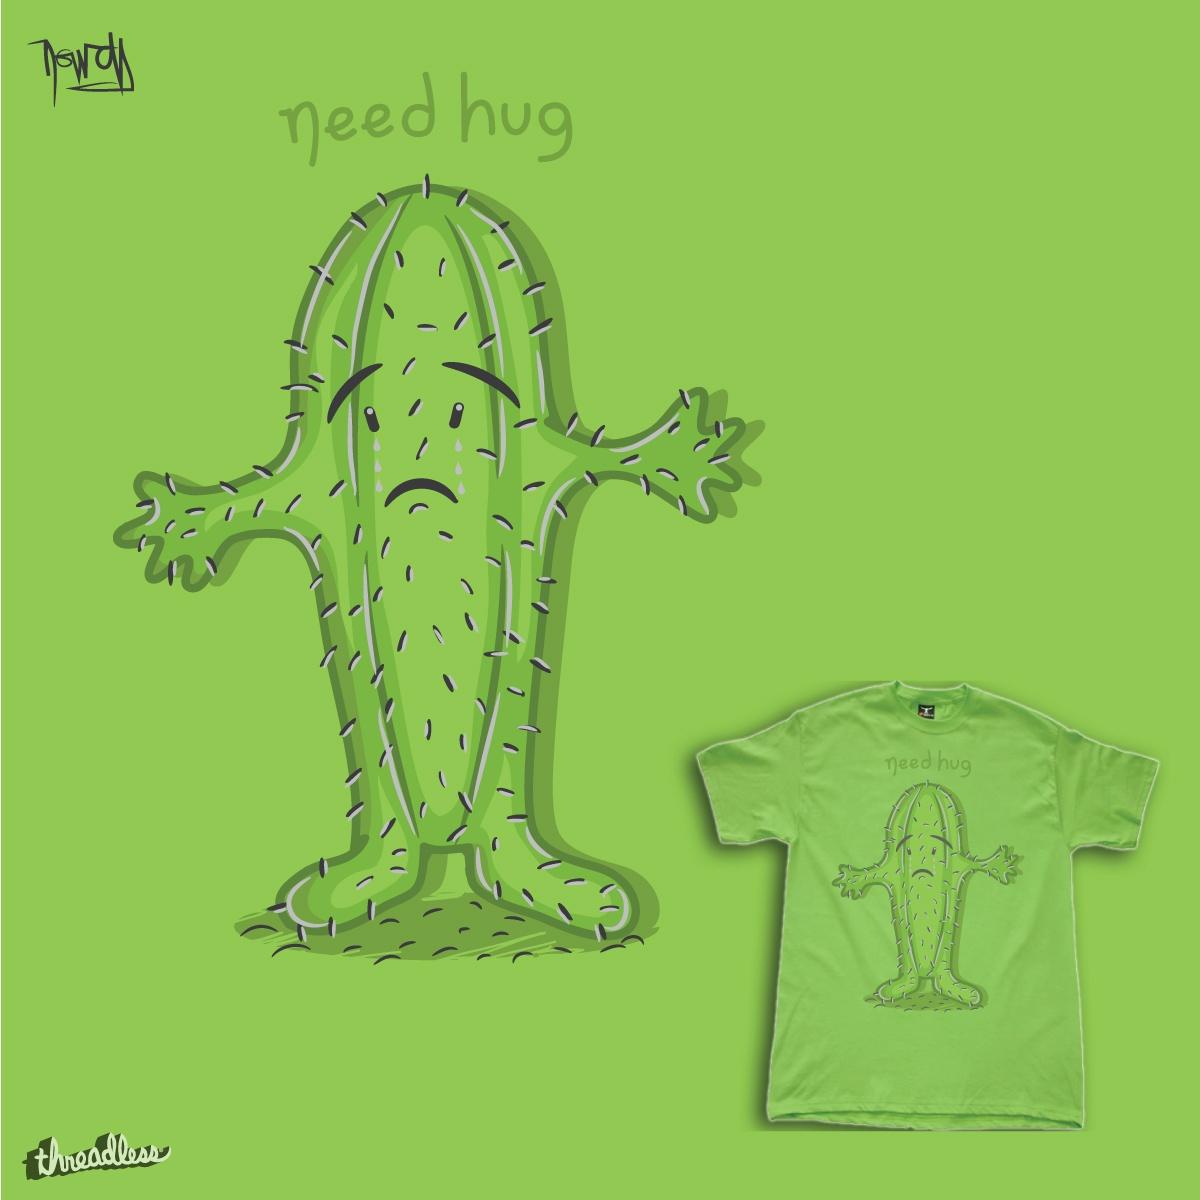 Need Hug. by je14 on Threadless